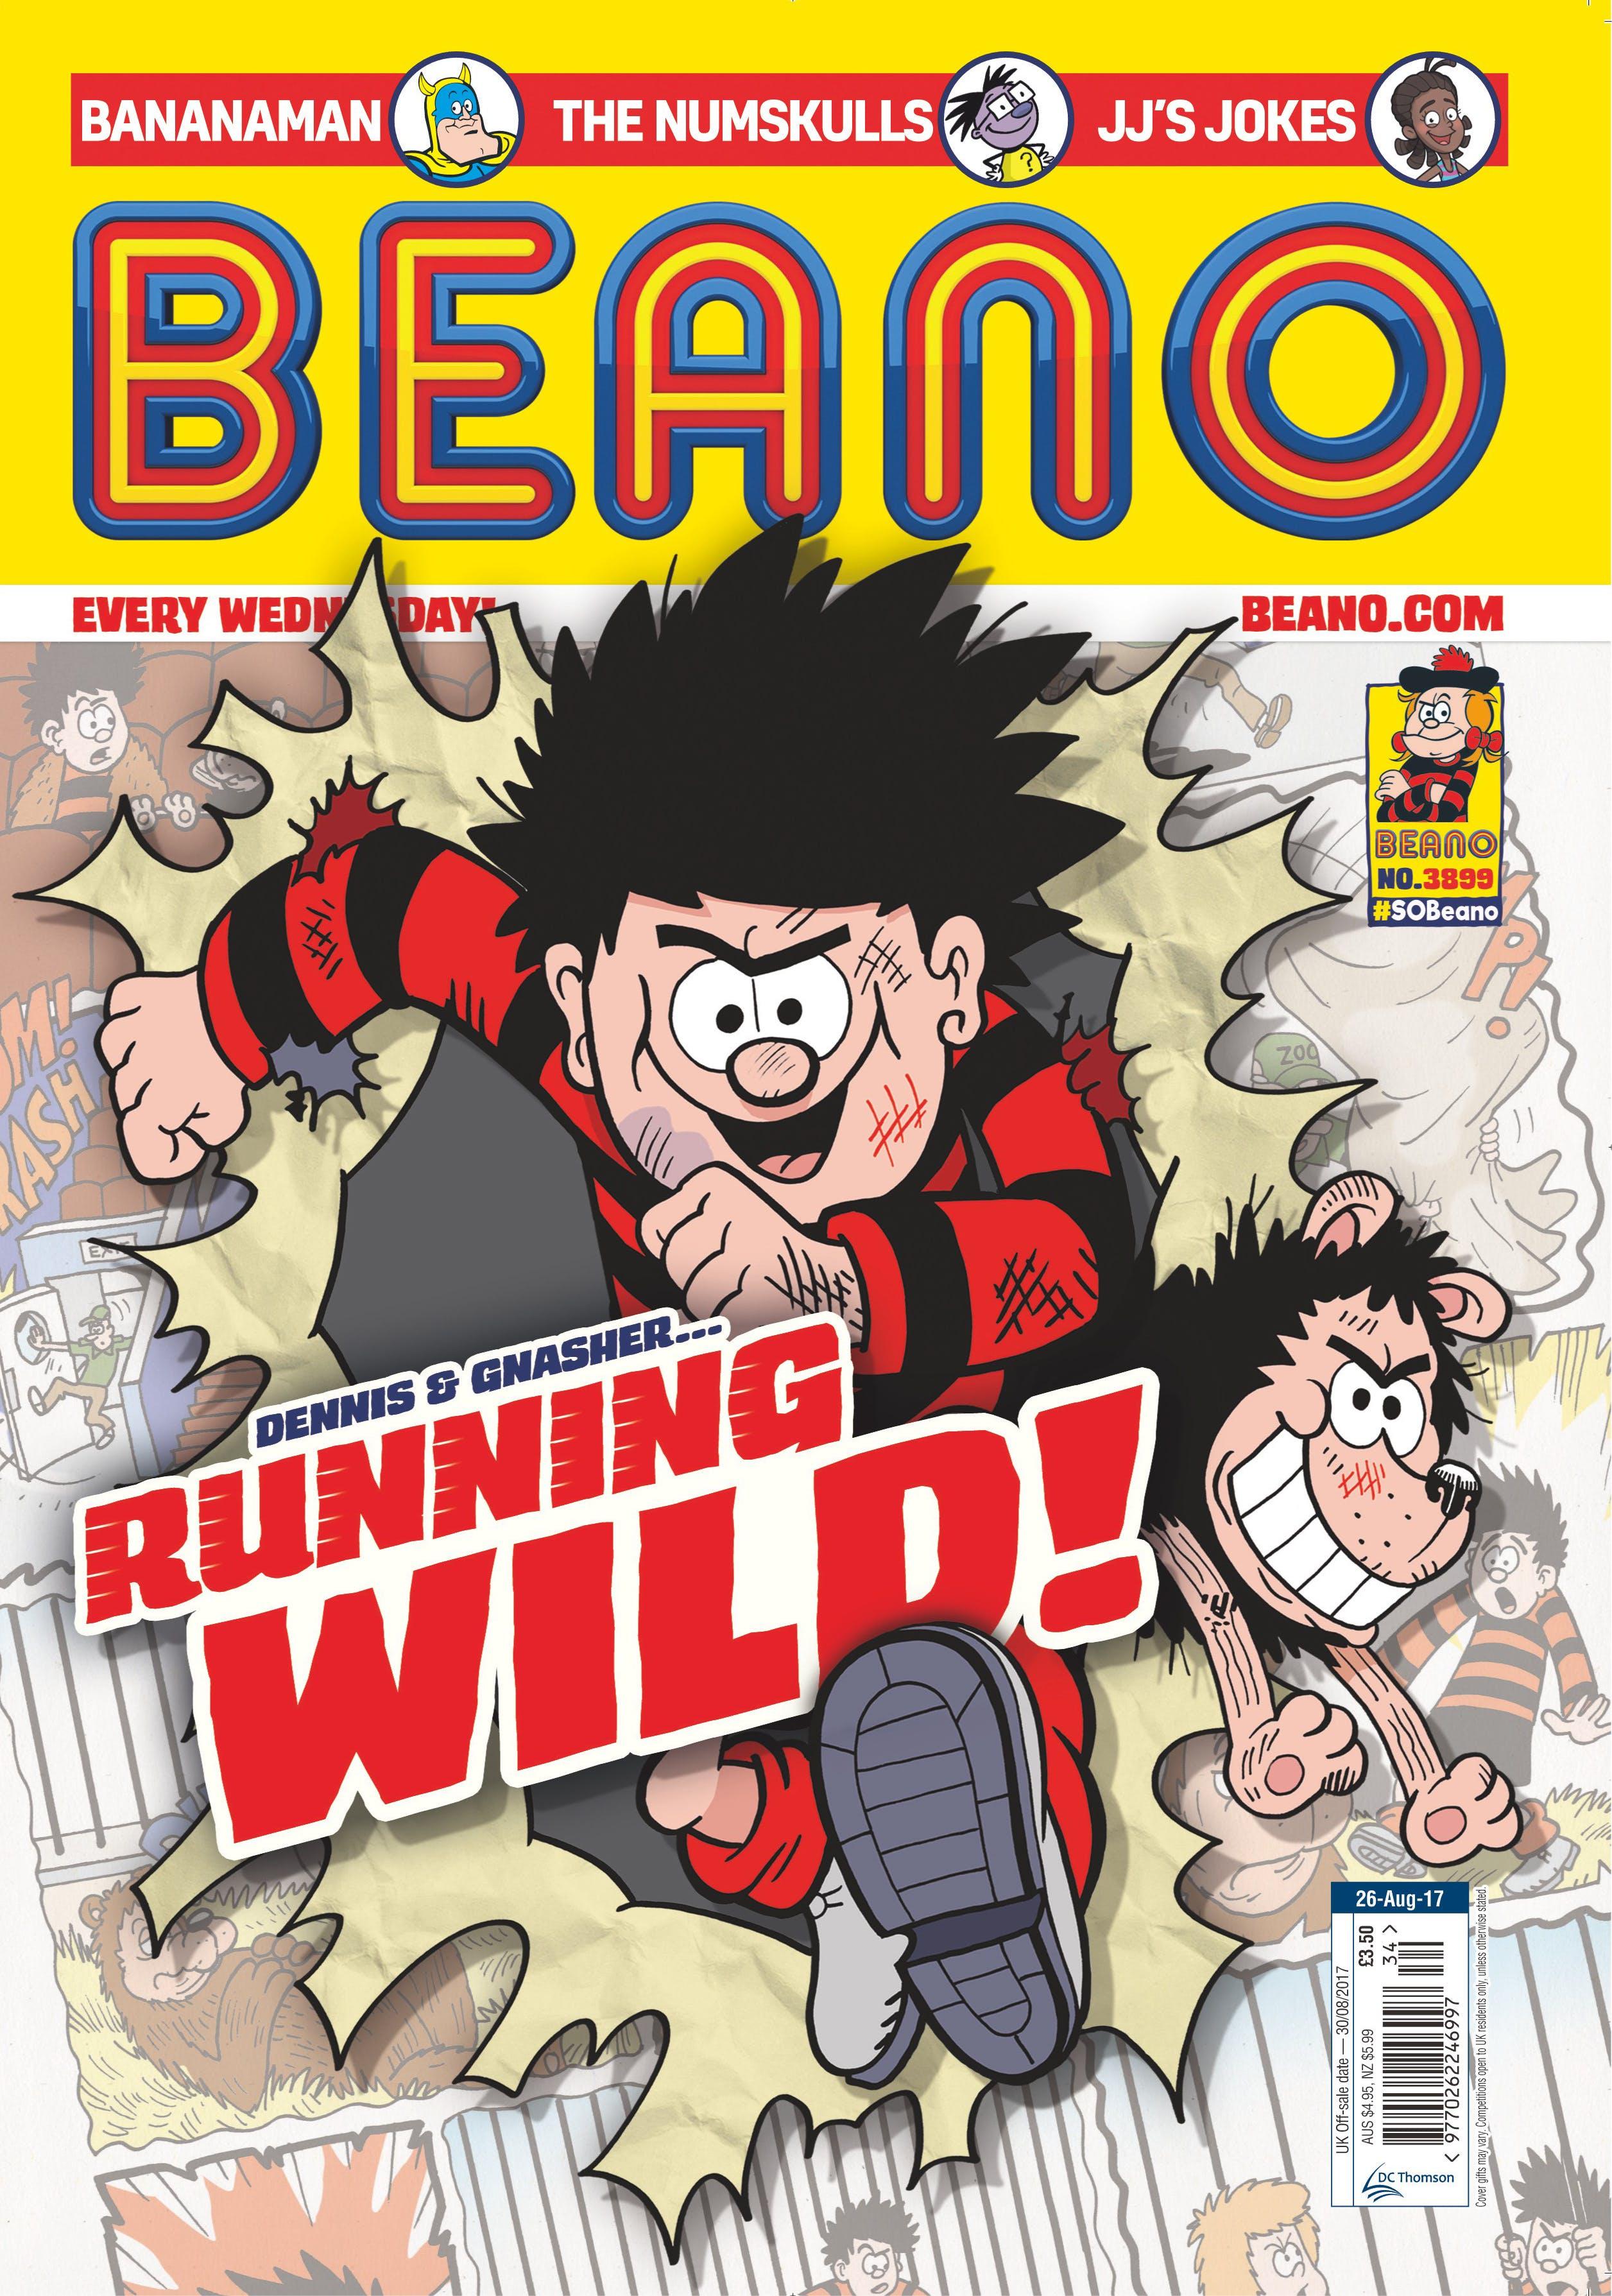 Beano cover 26.8.17